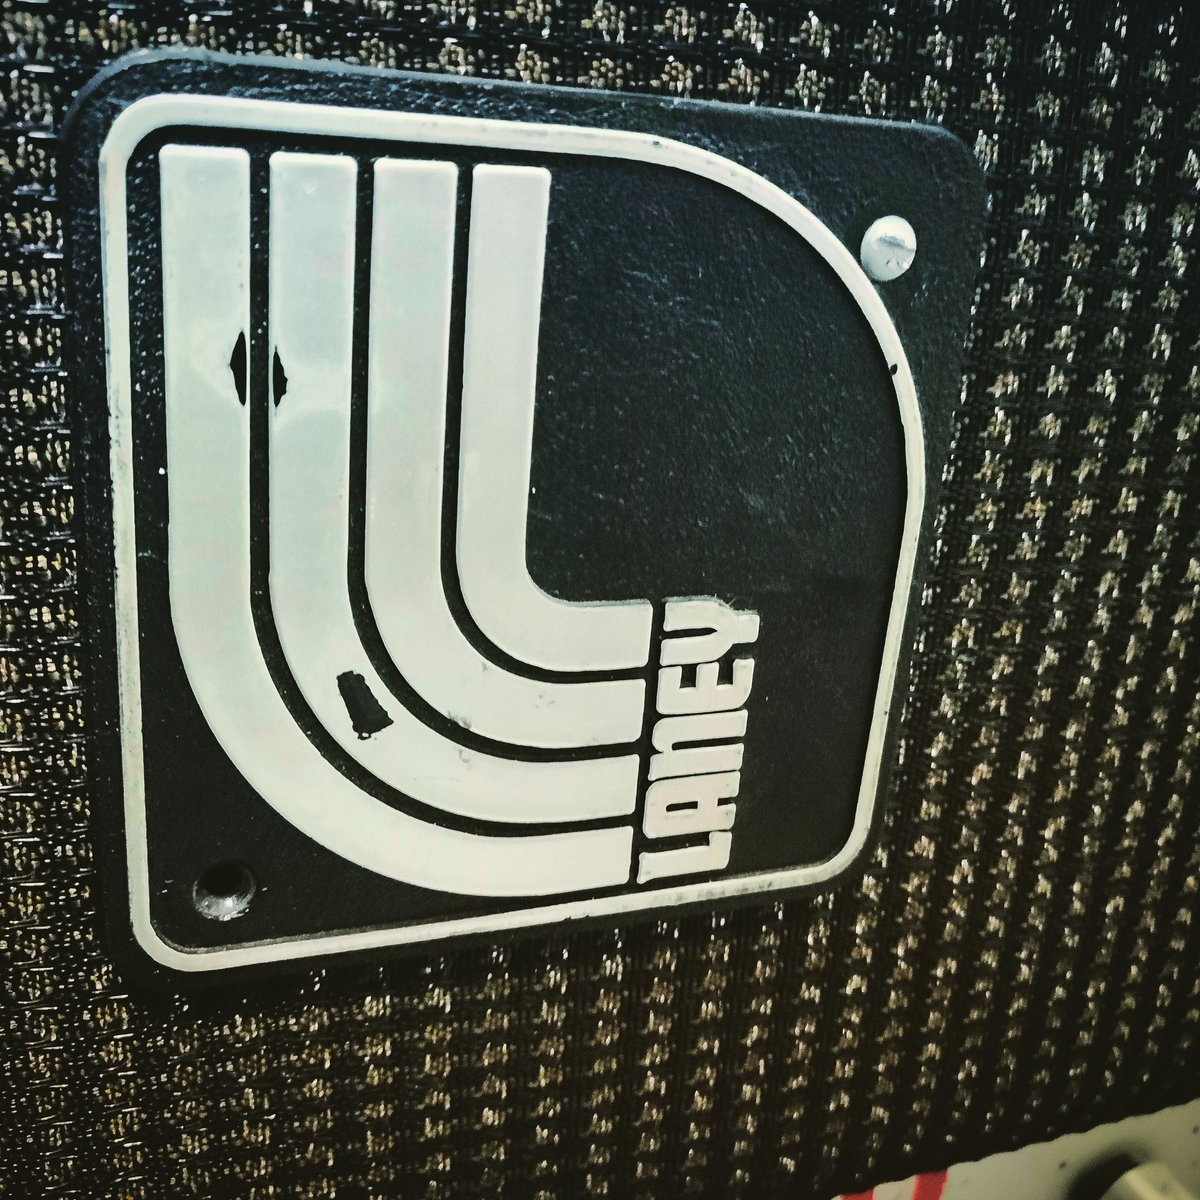 Again #laney #logo but different era pic.twitter.com/o8BJ1qpnao